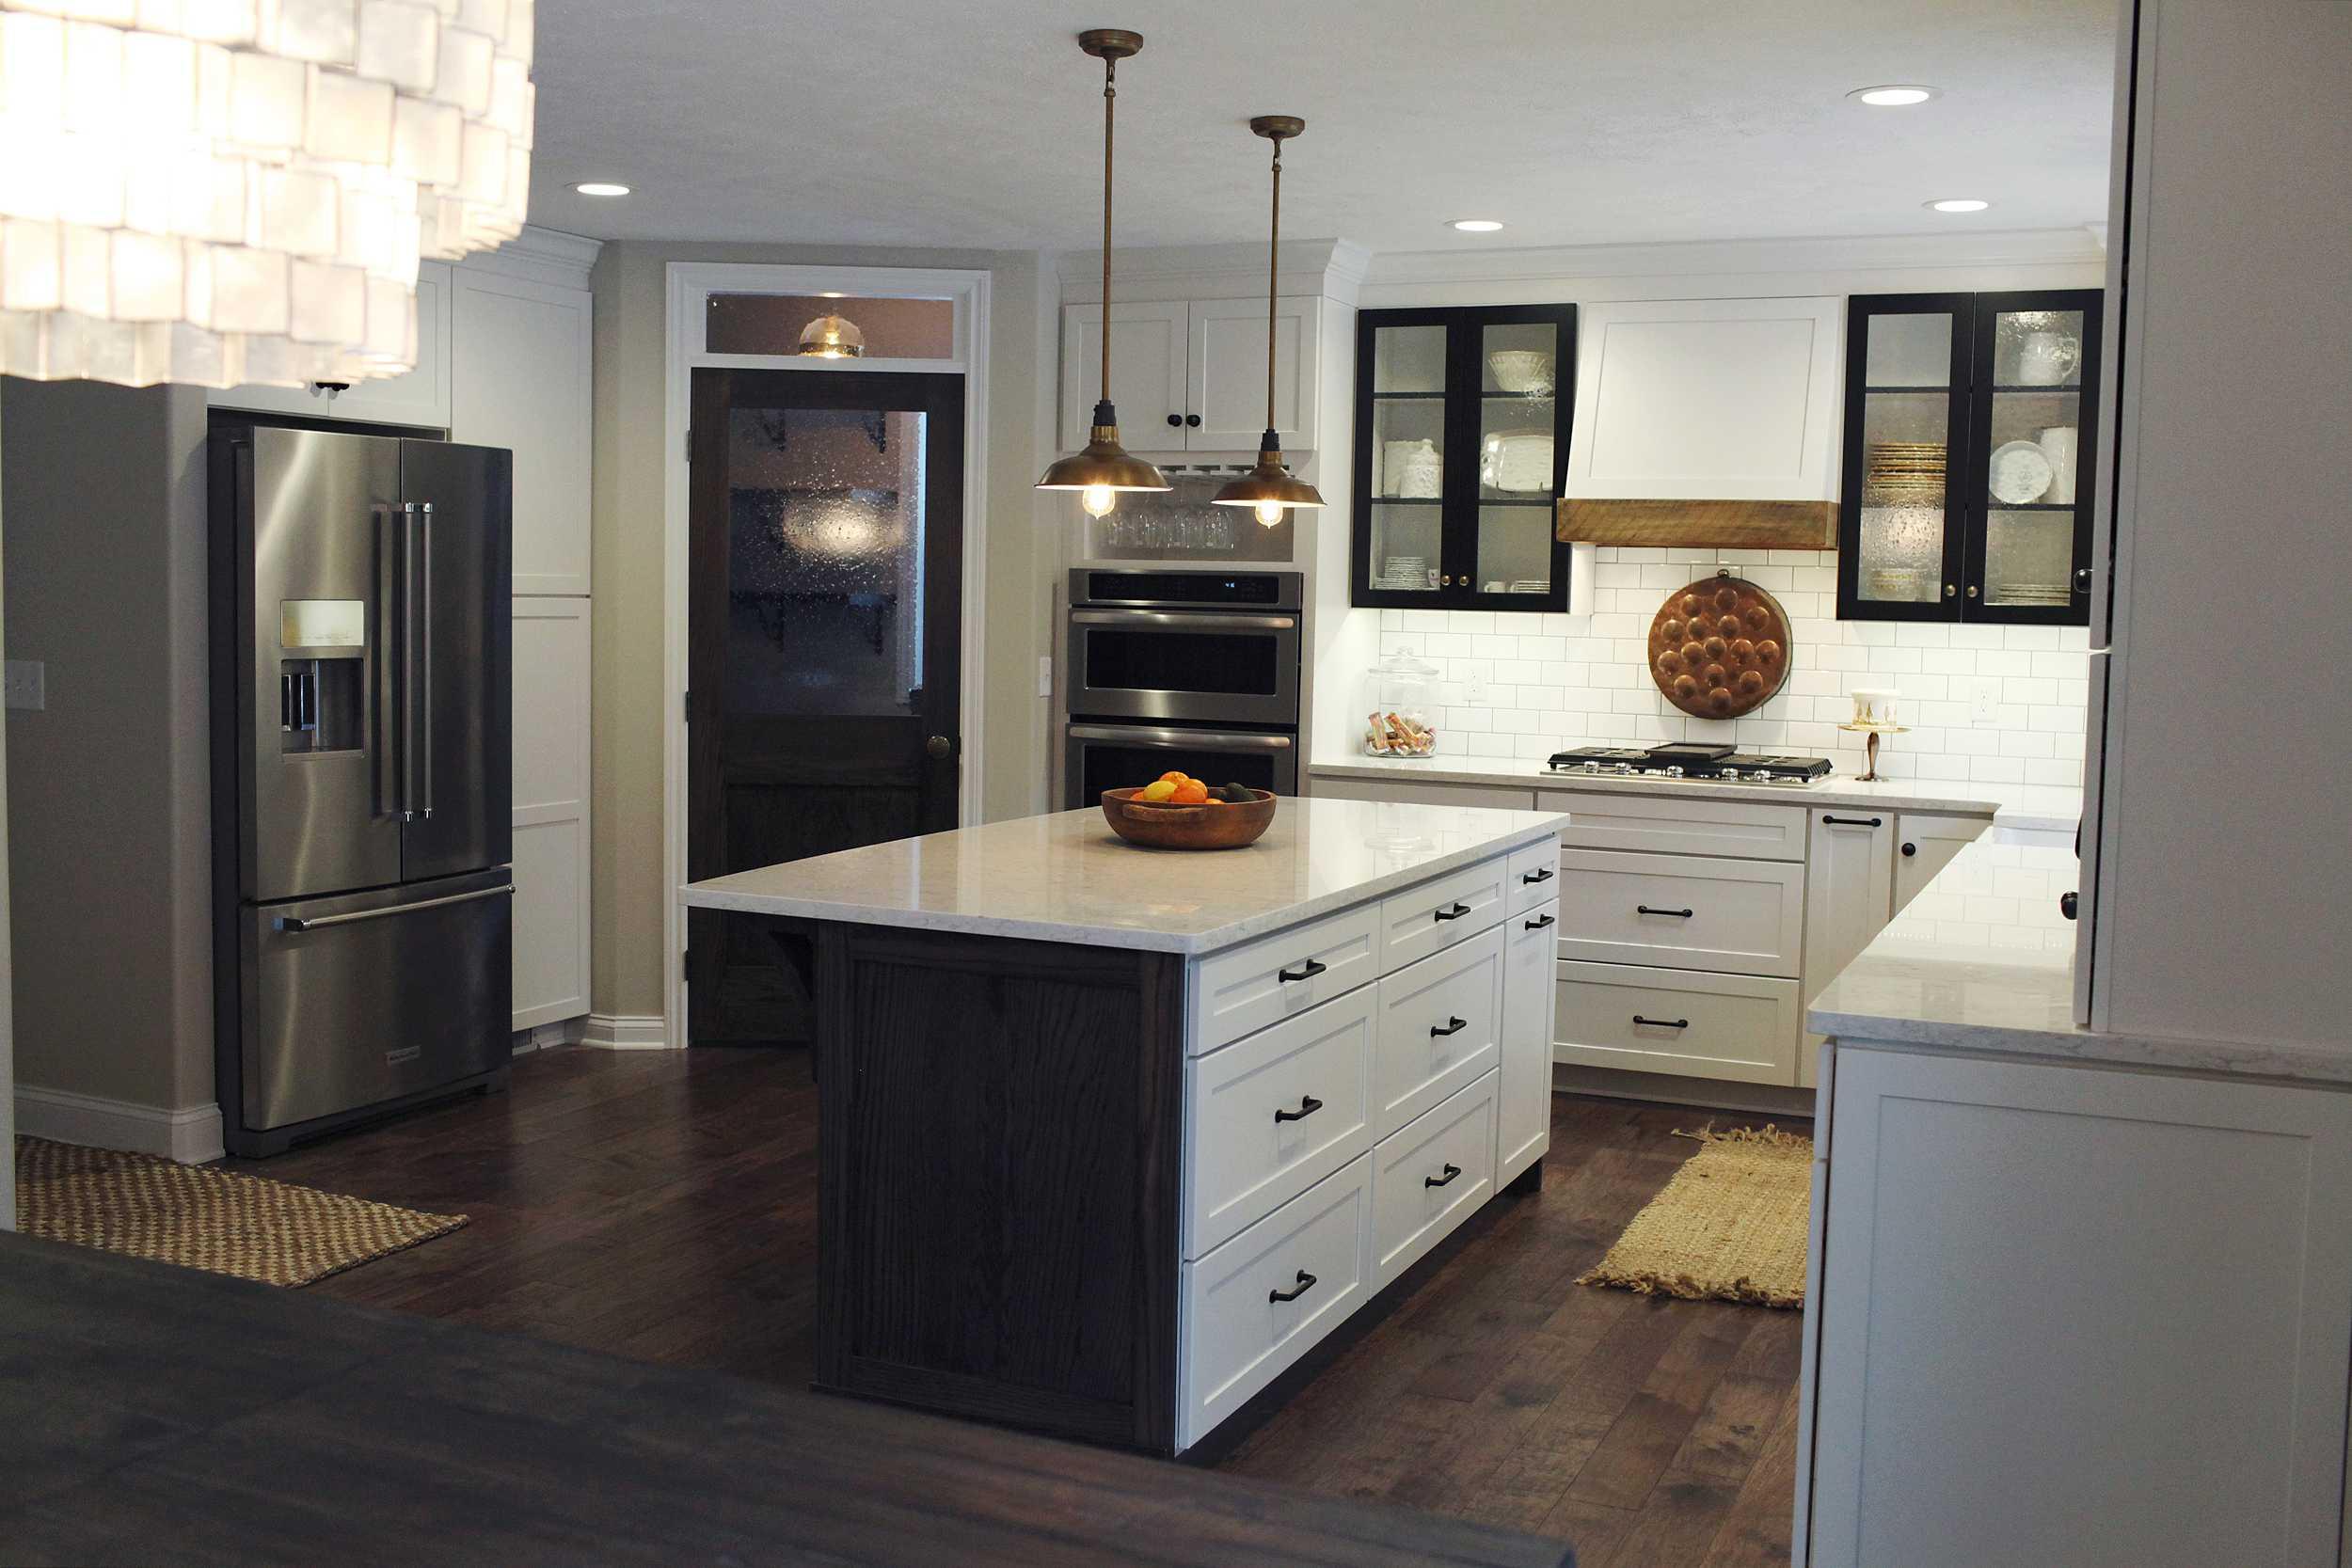 kitchen_remodel (6).jpg